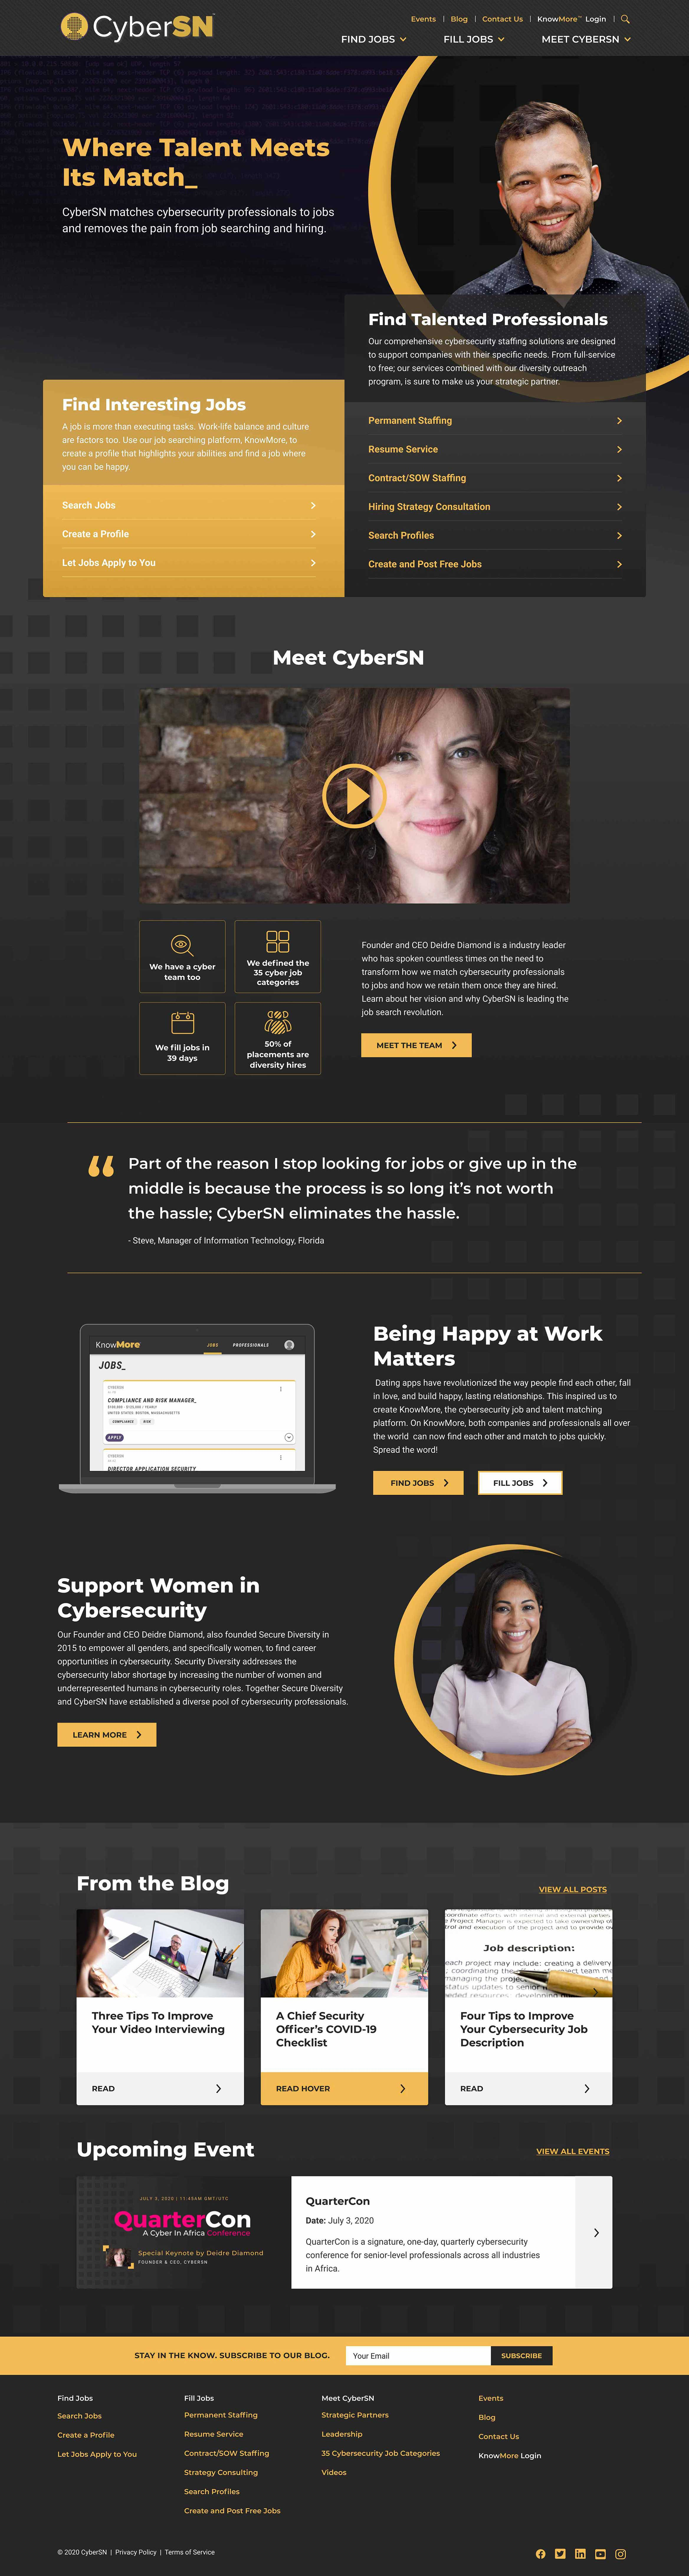 CyberSN Homepage